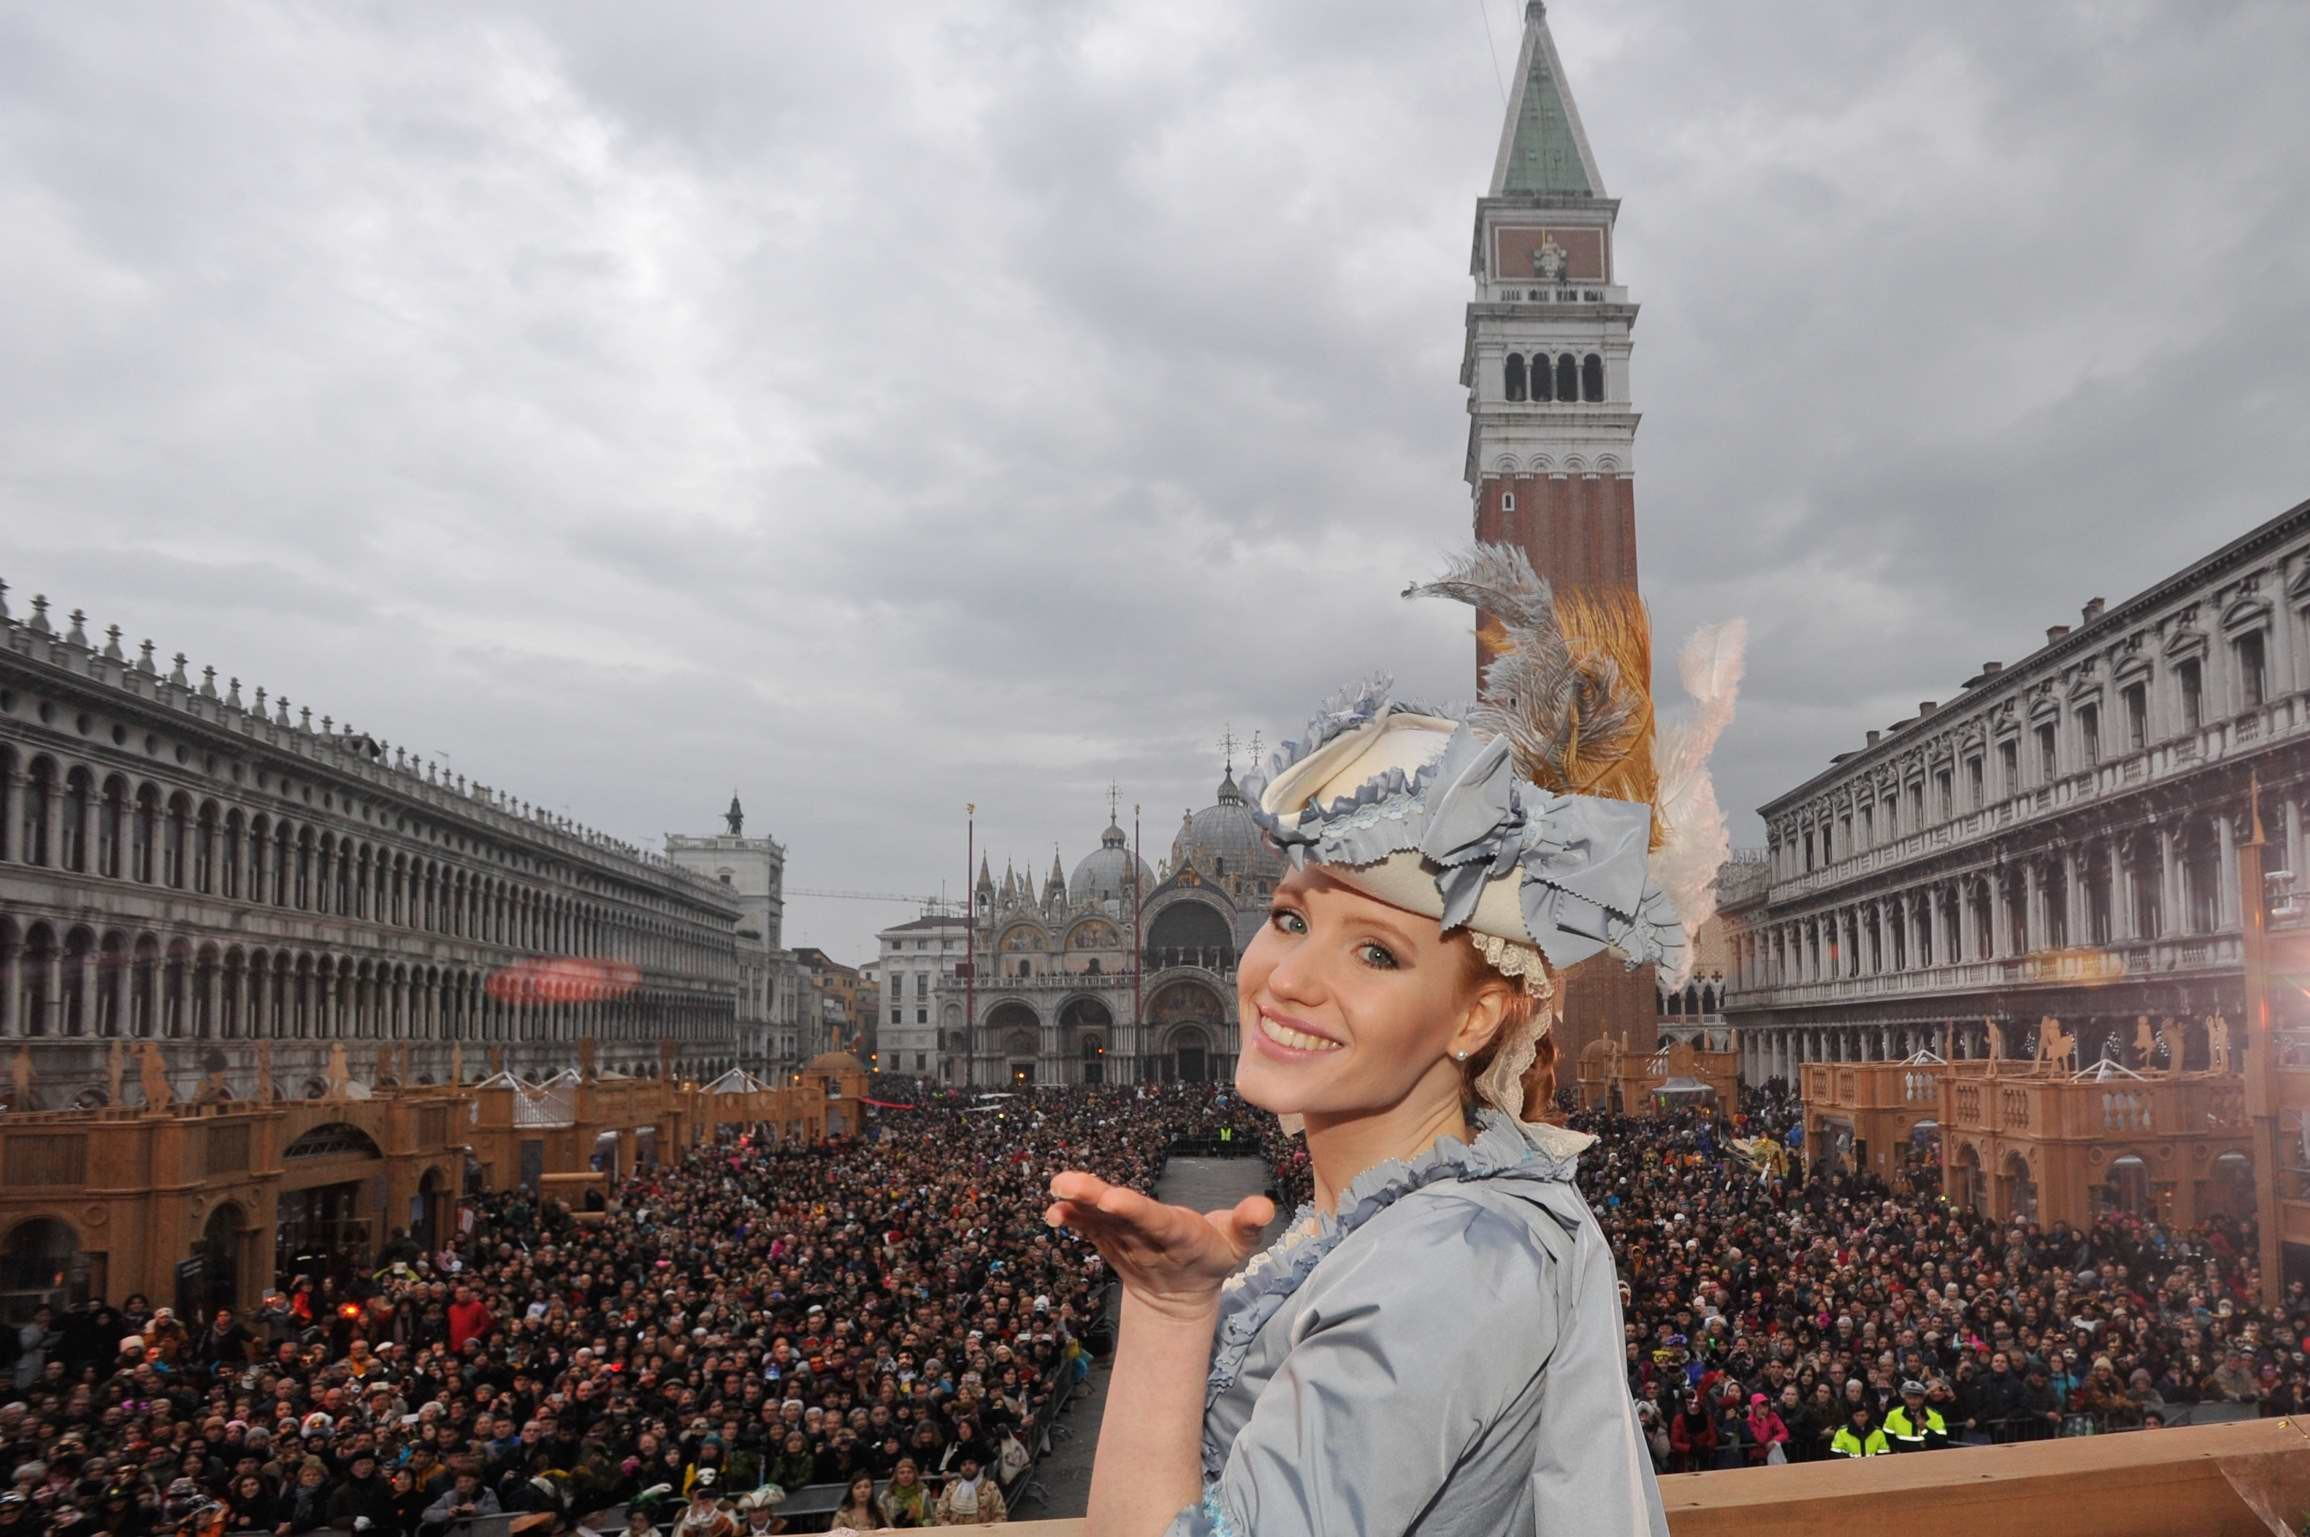 Claudia Marchiori dal campanile di Piazza San Marco per il Carnevale di Venezia